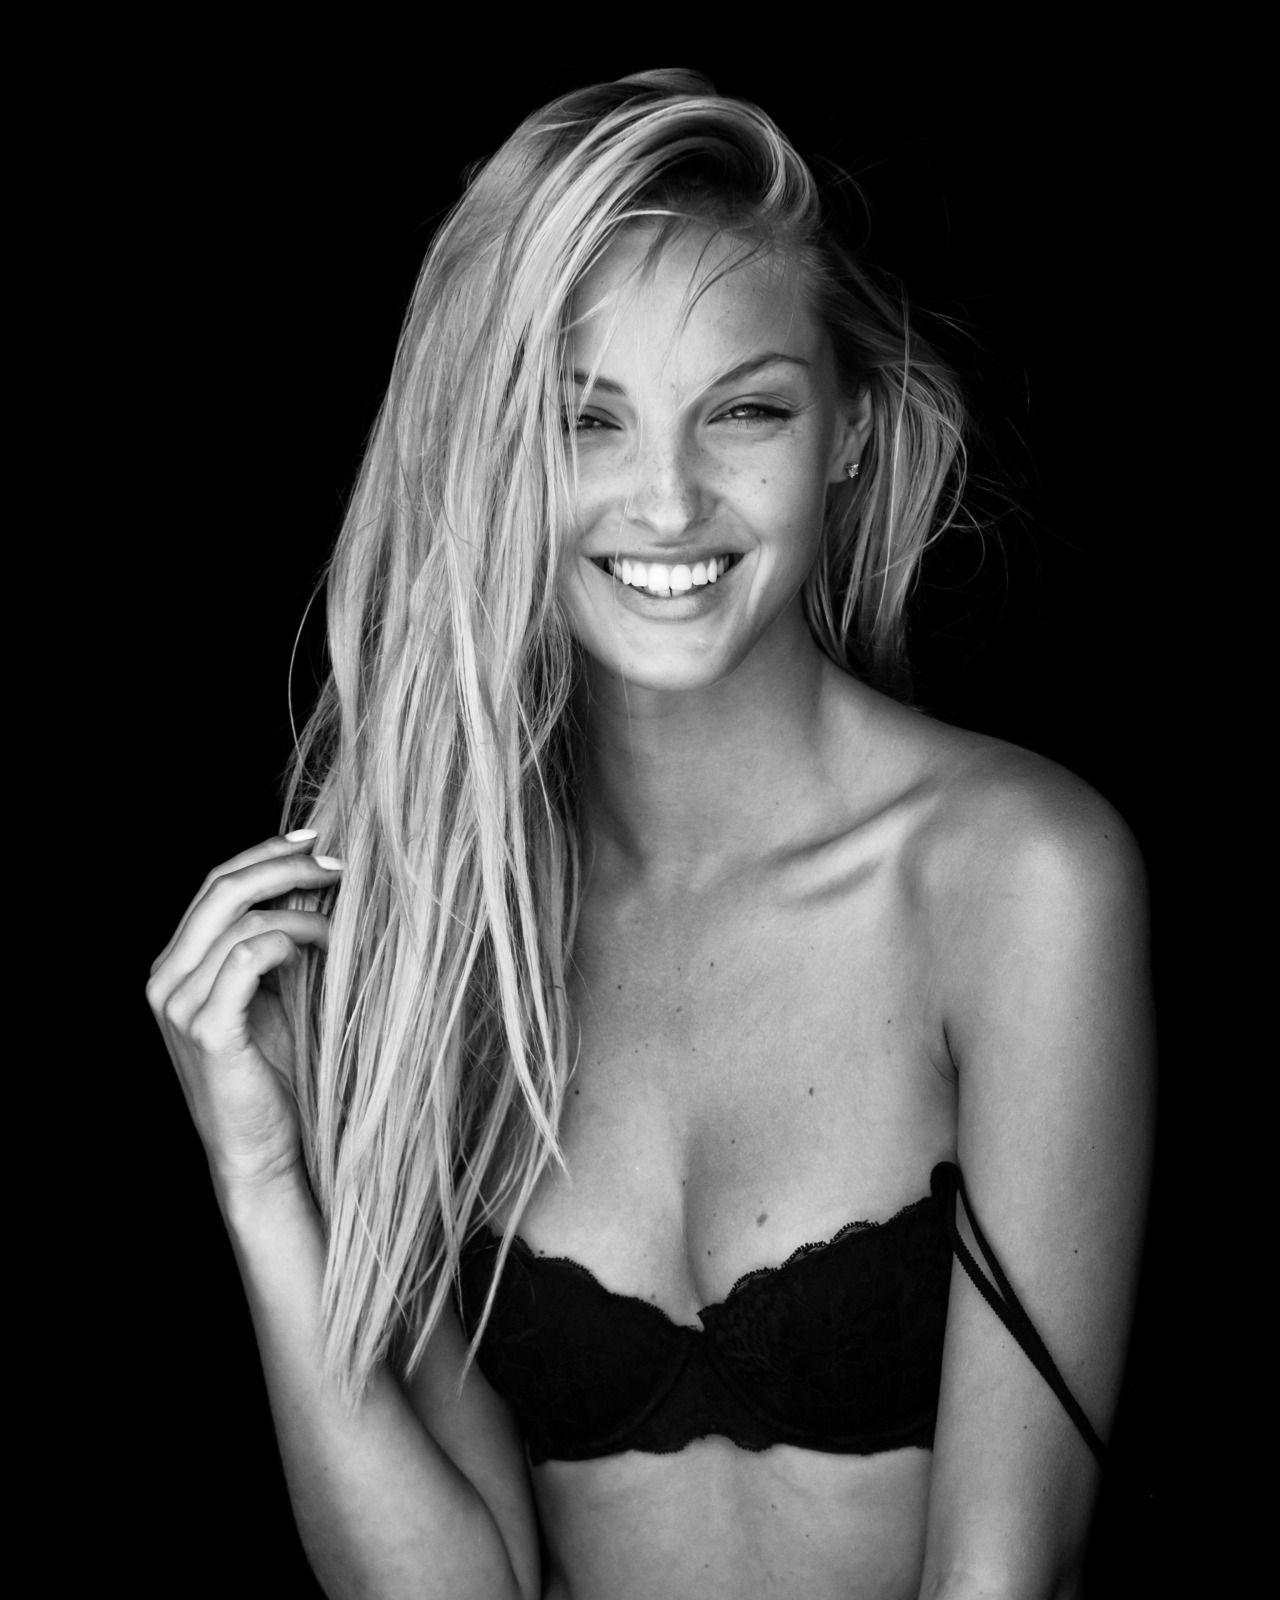 Young Kristina Sheiter nudes (38 photos), Topless, Bikini, Feet, swimsuit 2020